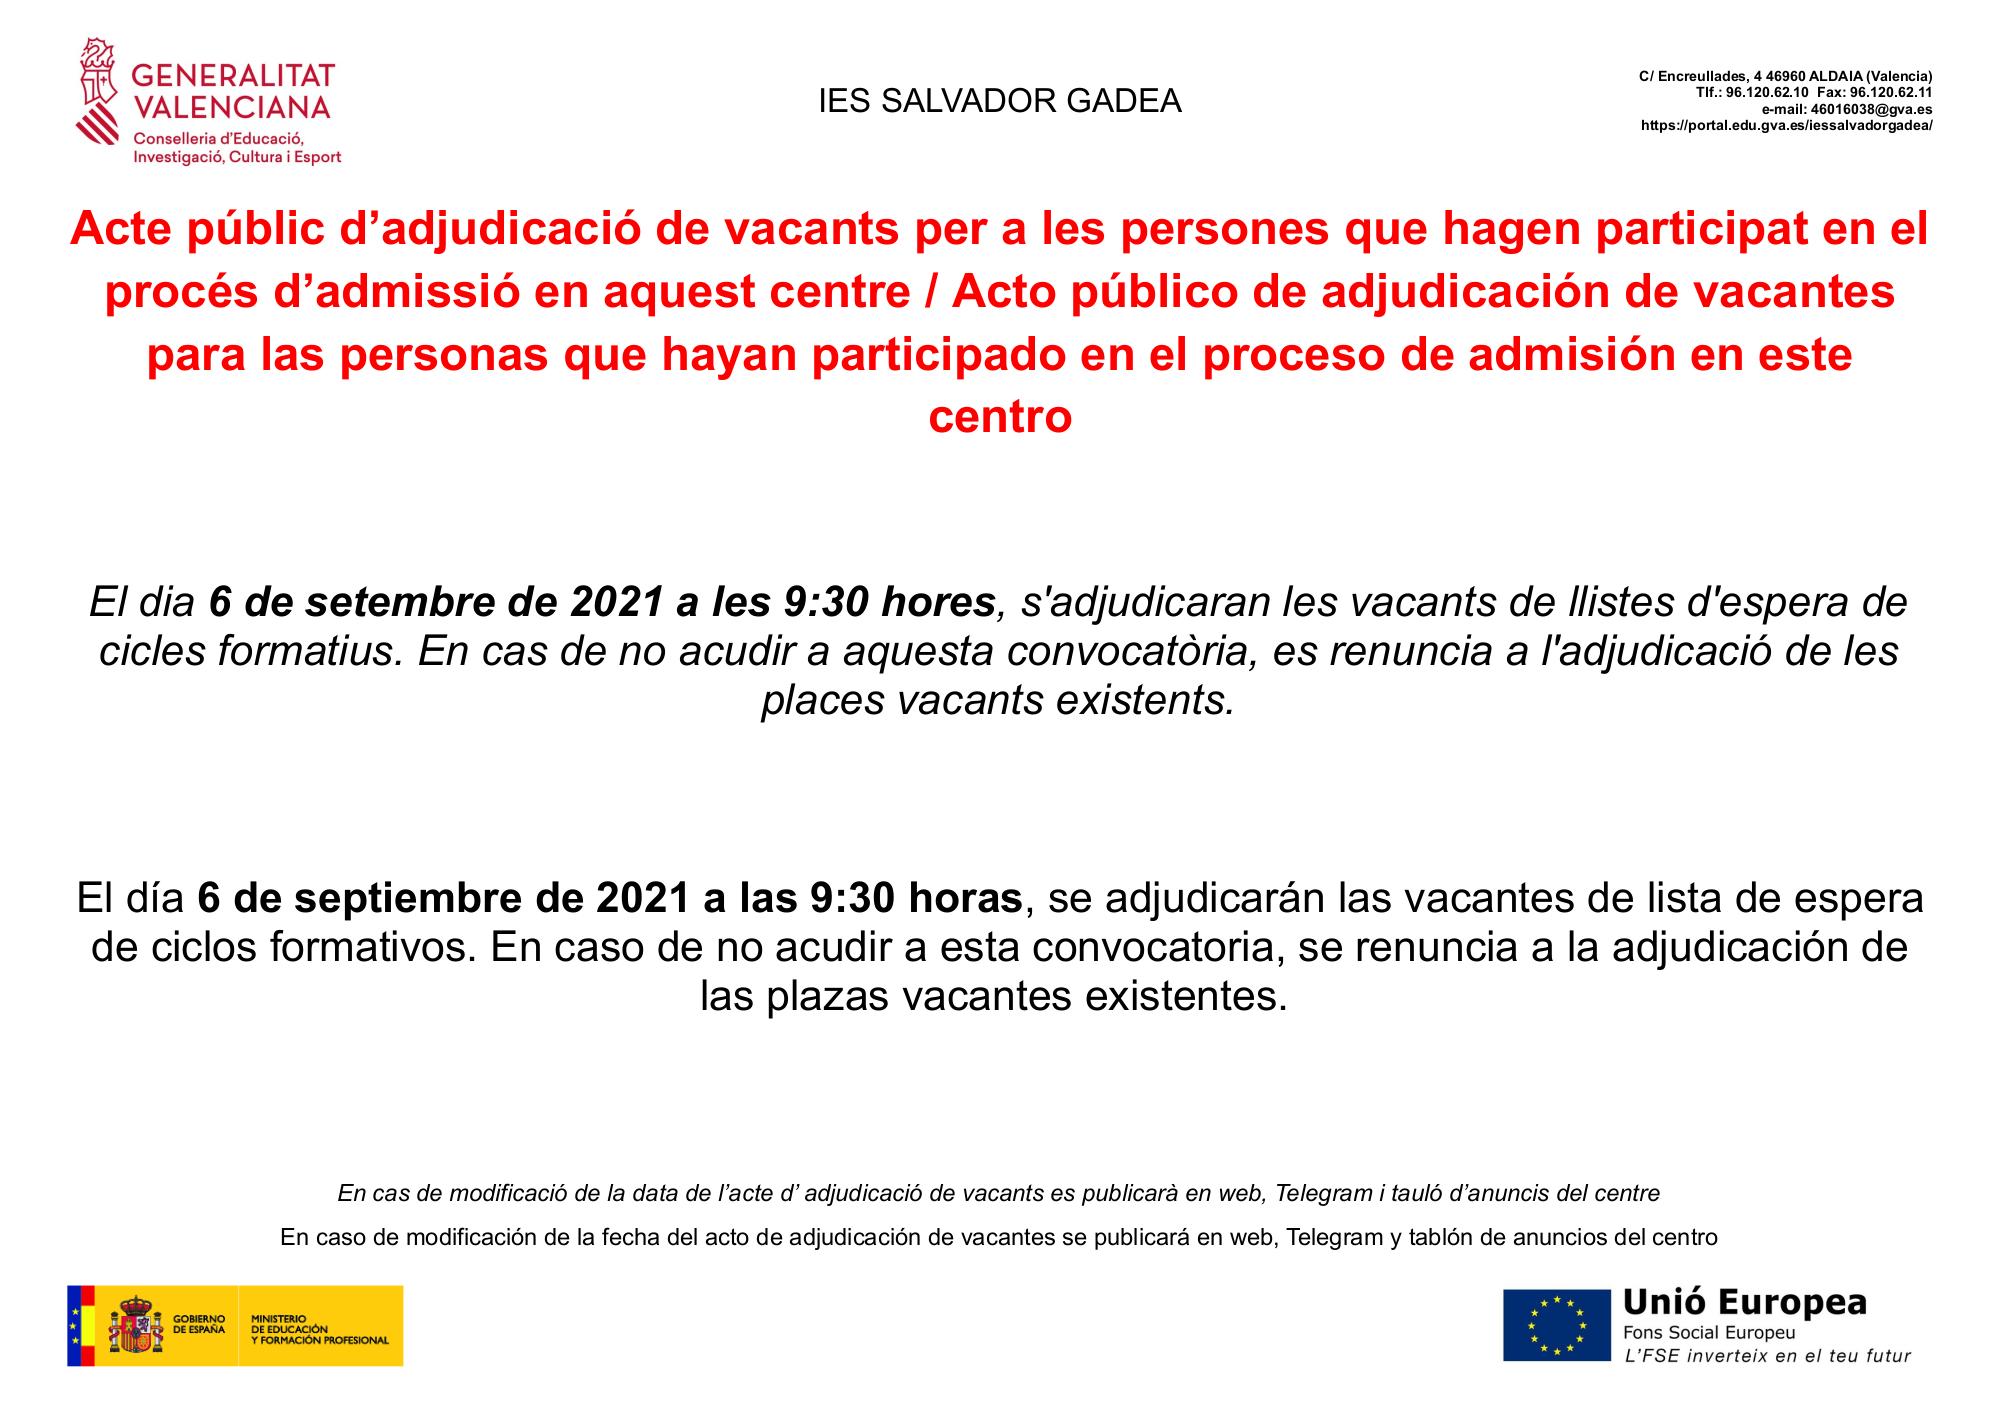 AdjudicacionVacantesListaEsperaCentro2021-2022